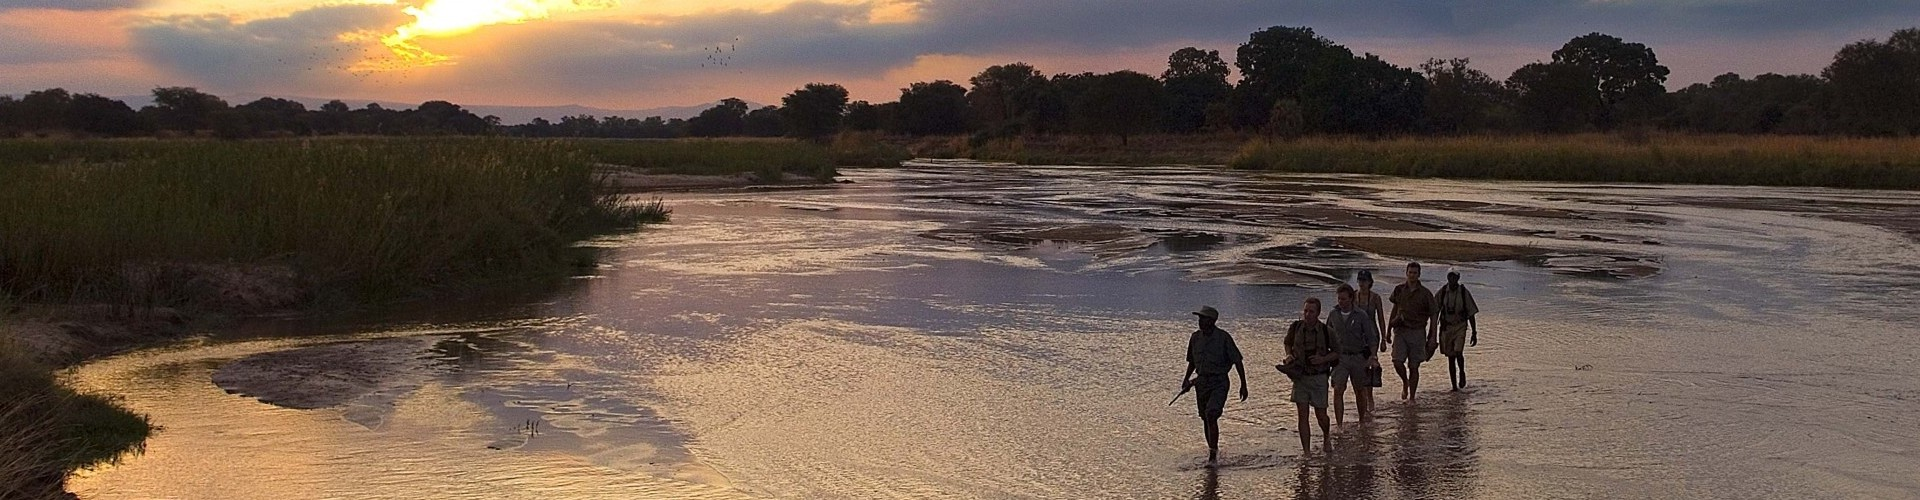 Walking across the Mupamadzi